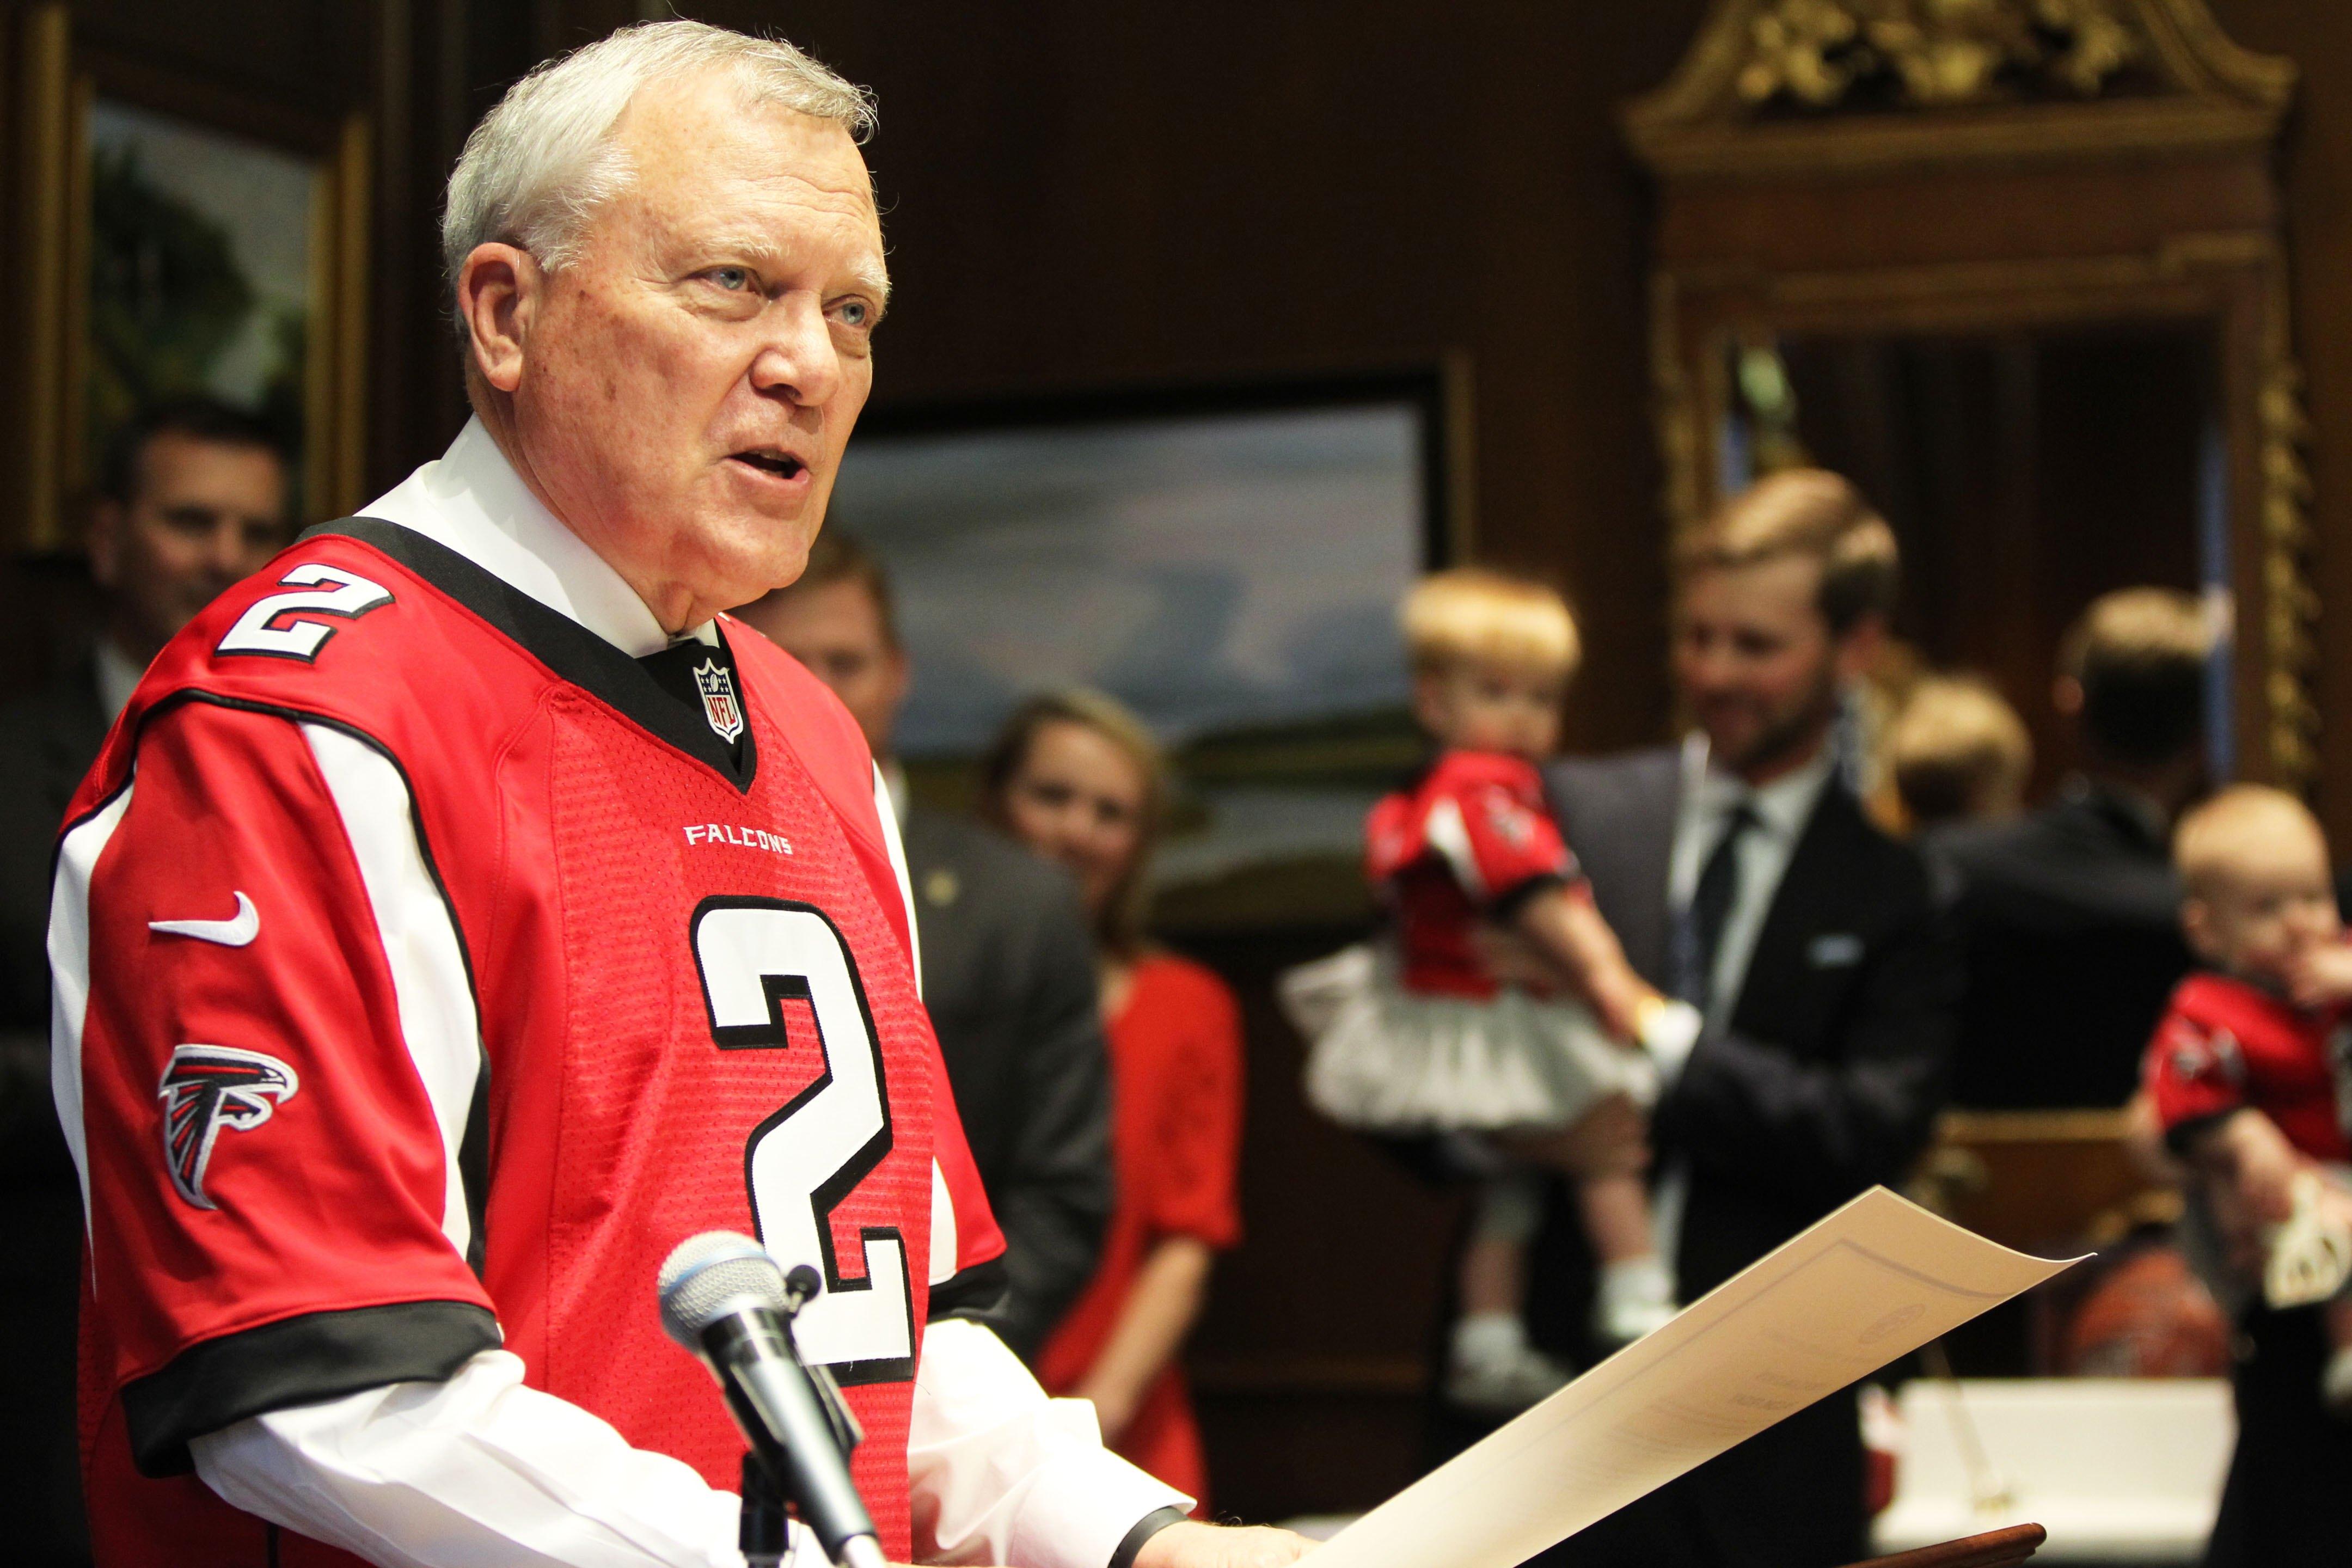 Georgia governor proclaims 'Falcons Friday' ahead of Super Bowl